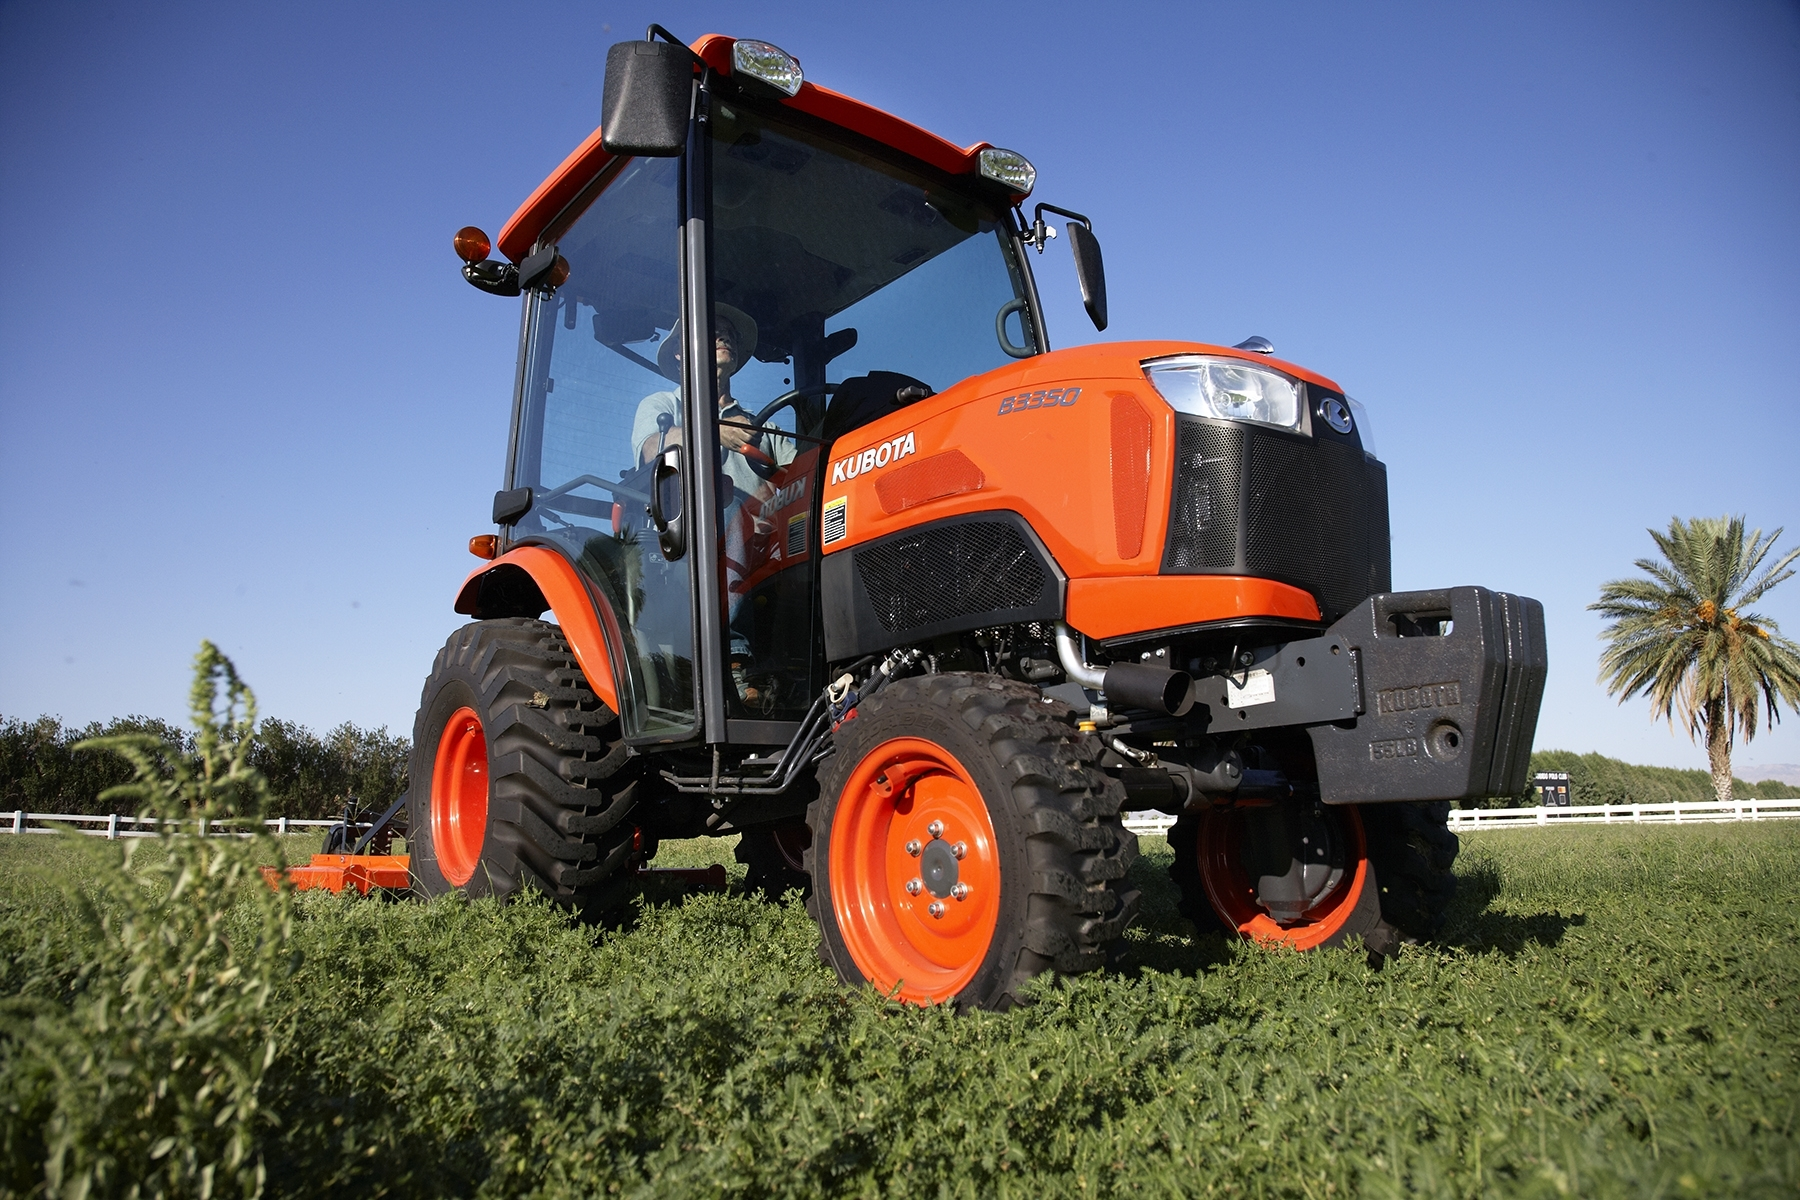 hight resolution of kubota unveils new b50 series tractors with factory integrated cabs ferrari electrical wiring diagram electrical wiring diagram kubota b2650